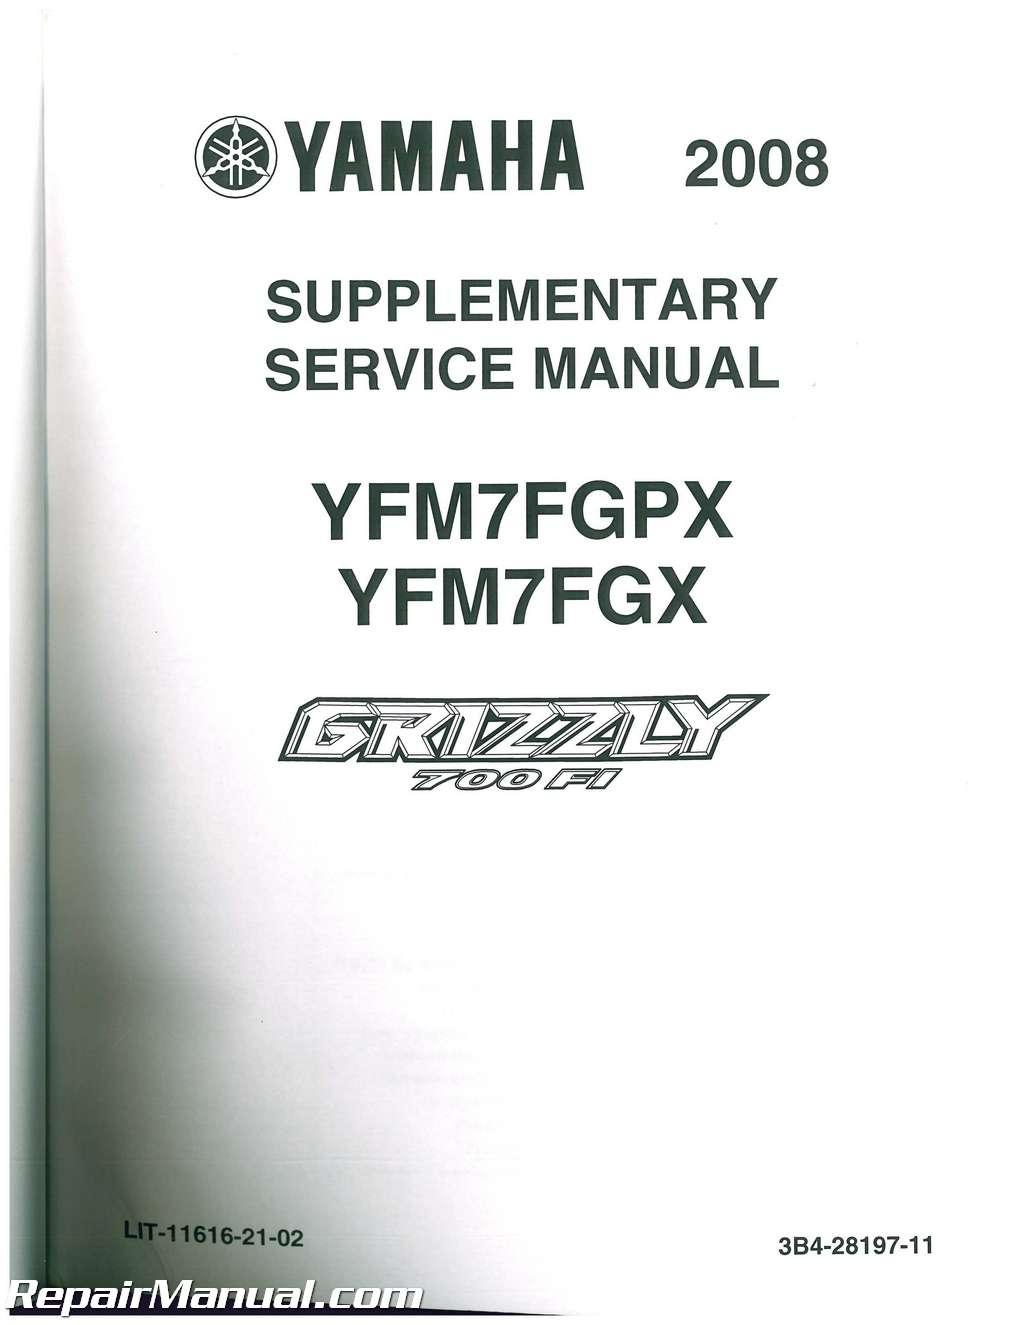 2007 – 2008 Yamaha YFM700 Grizzly ATV Service Manual